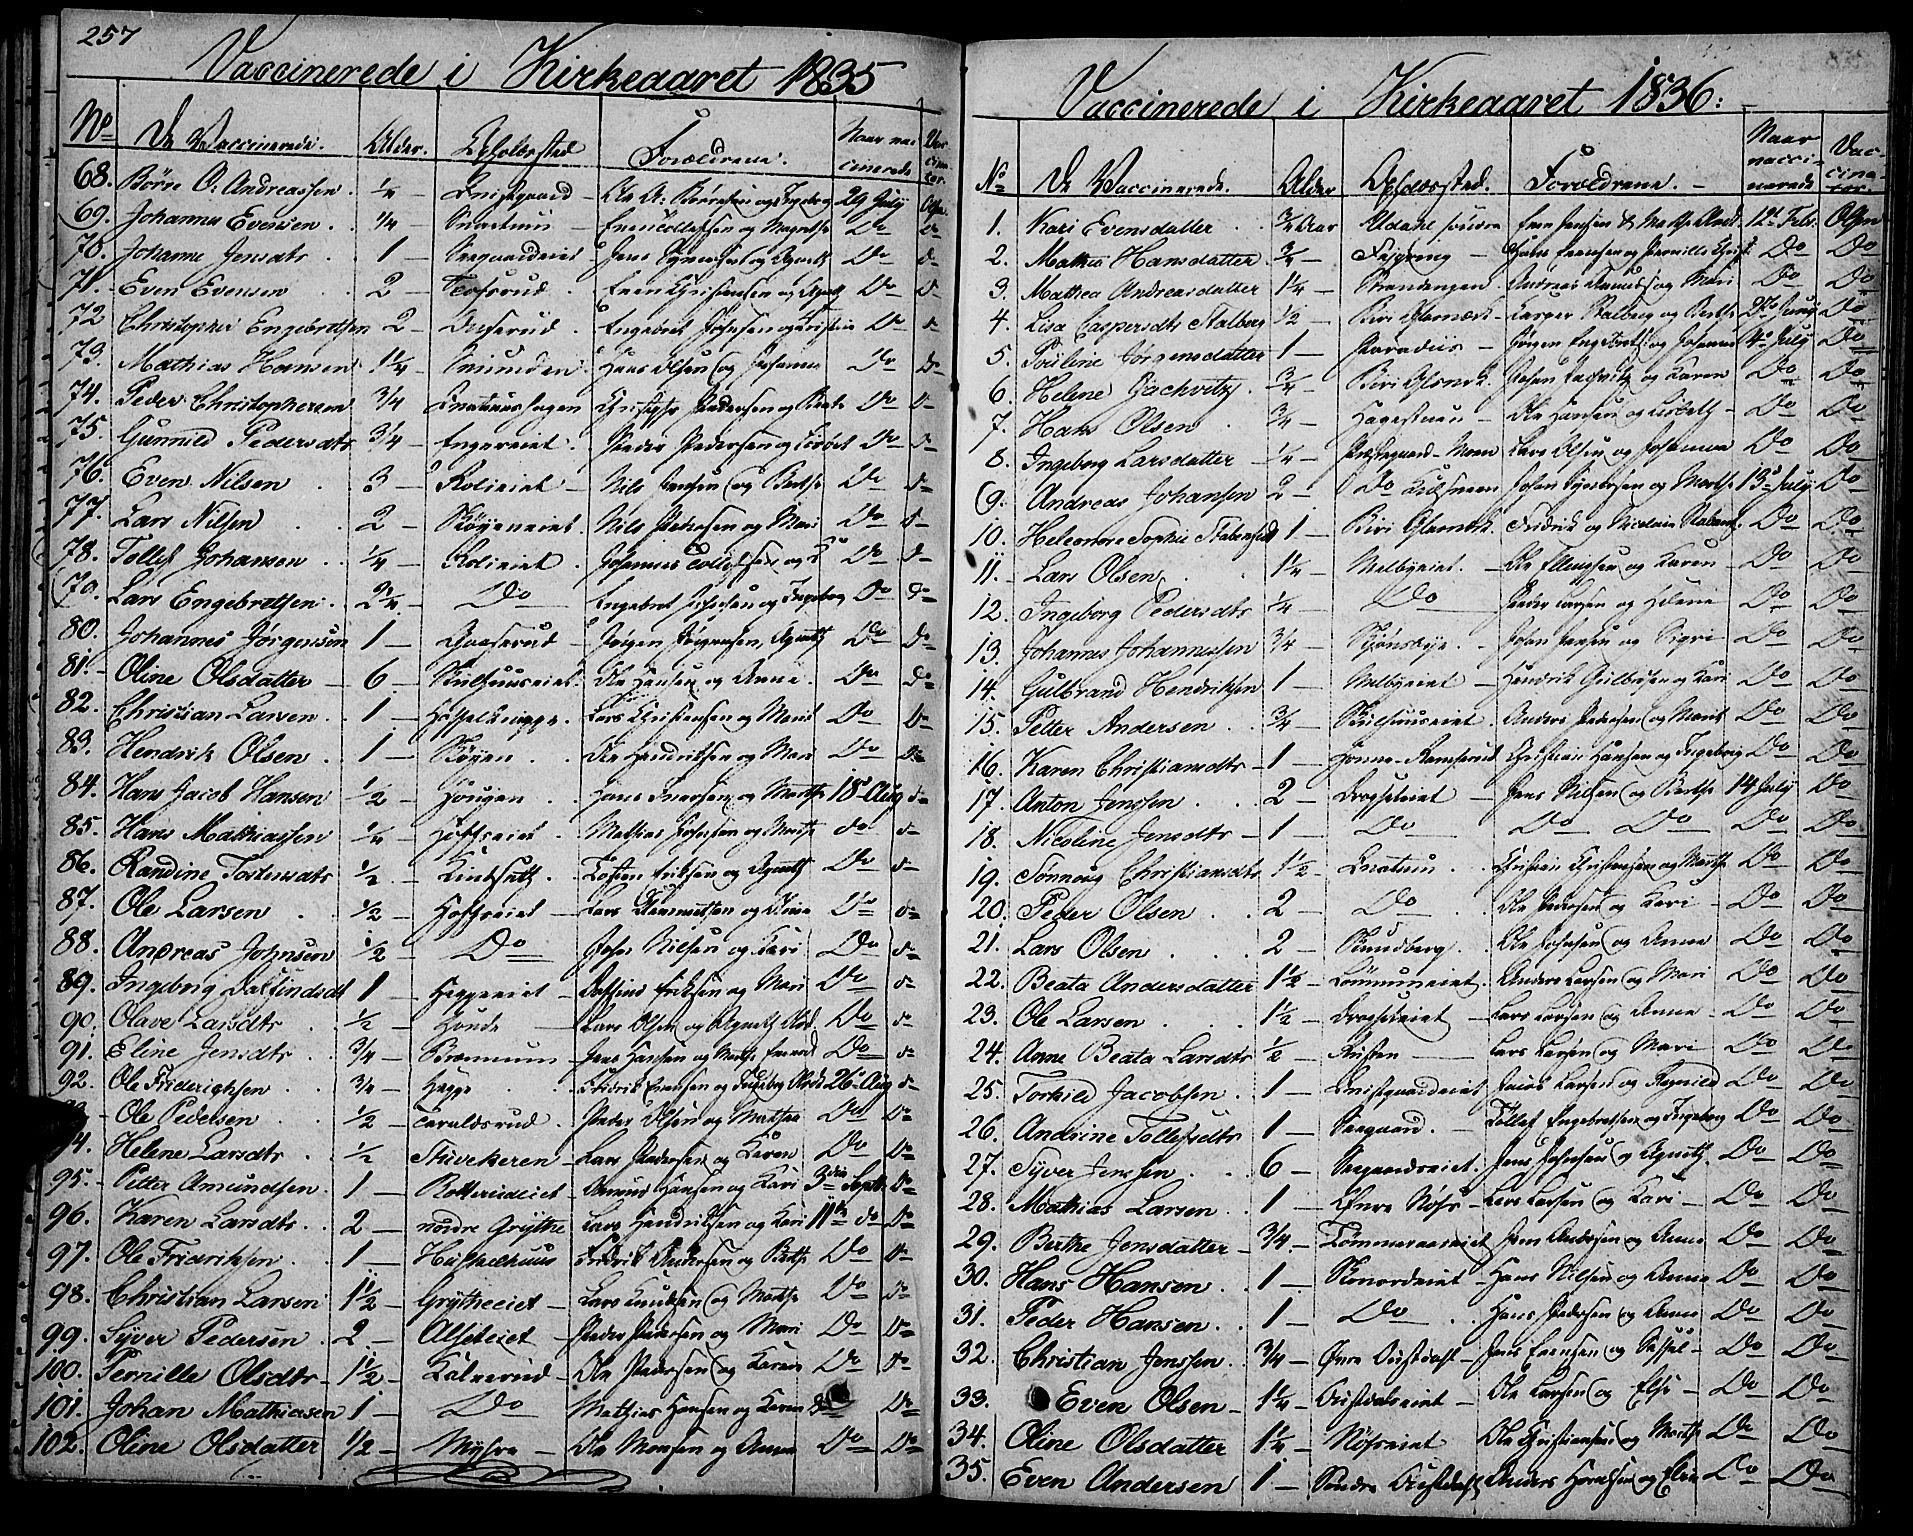 SAH, Biri prestekontor, Ministerialbok nr. 4, 1829-1842, s. 257